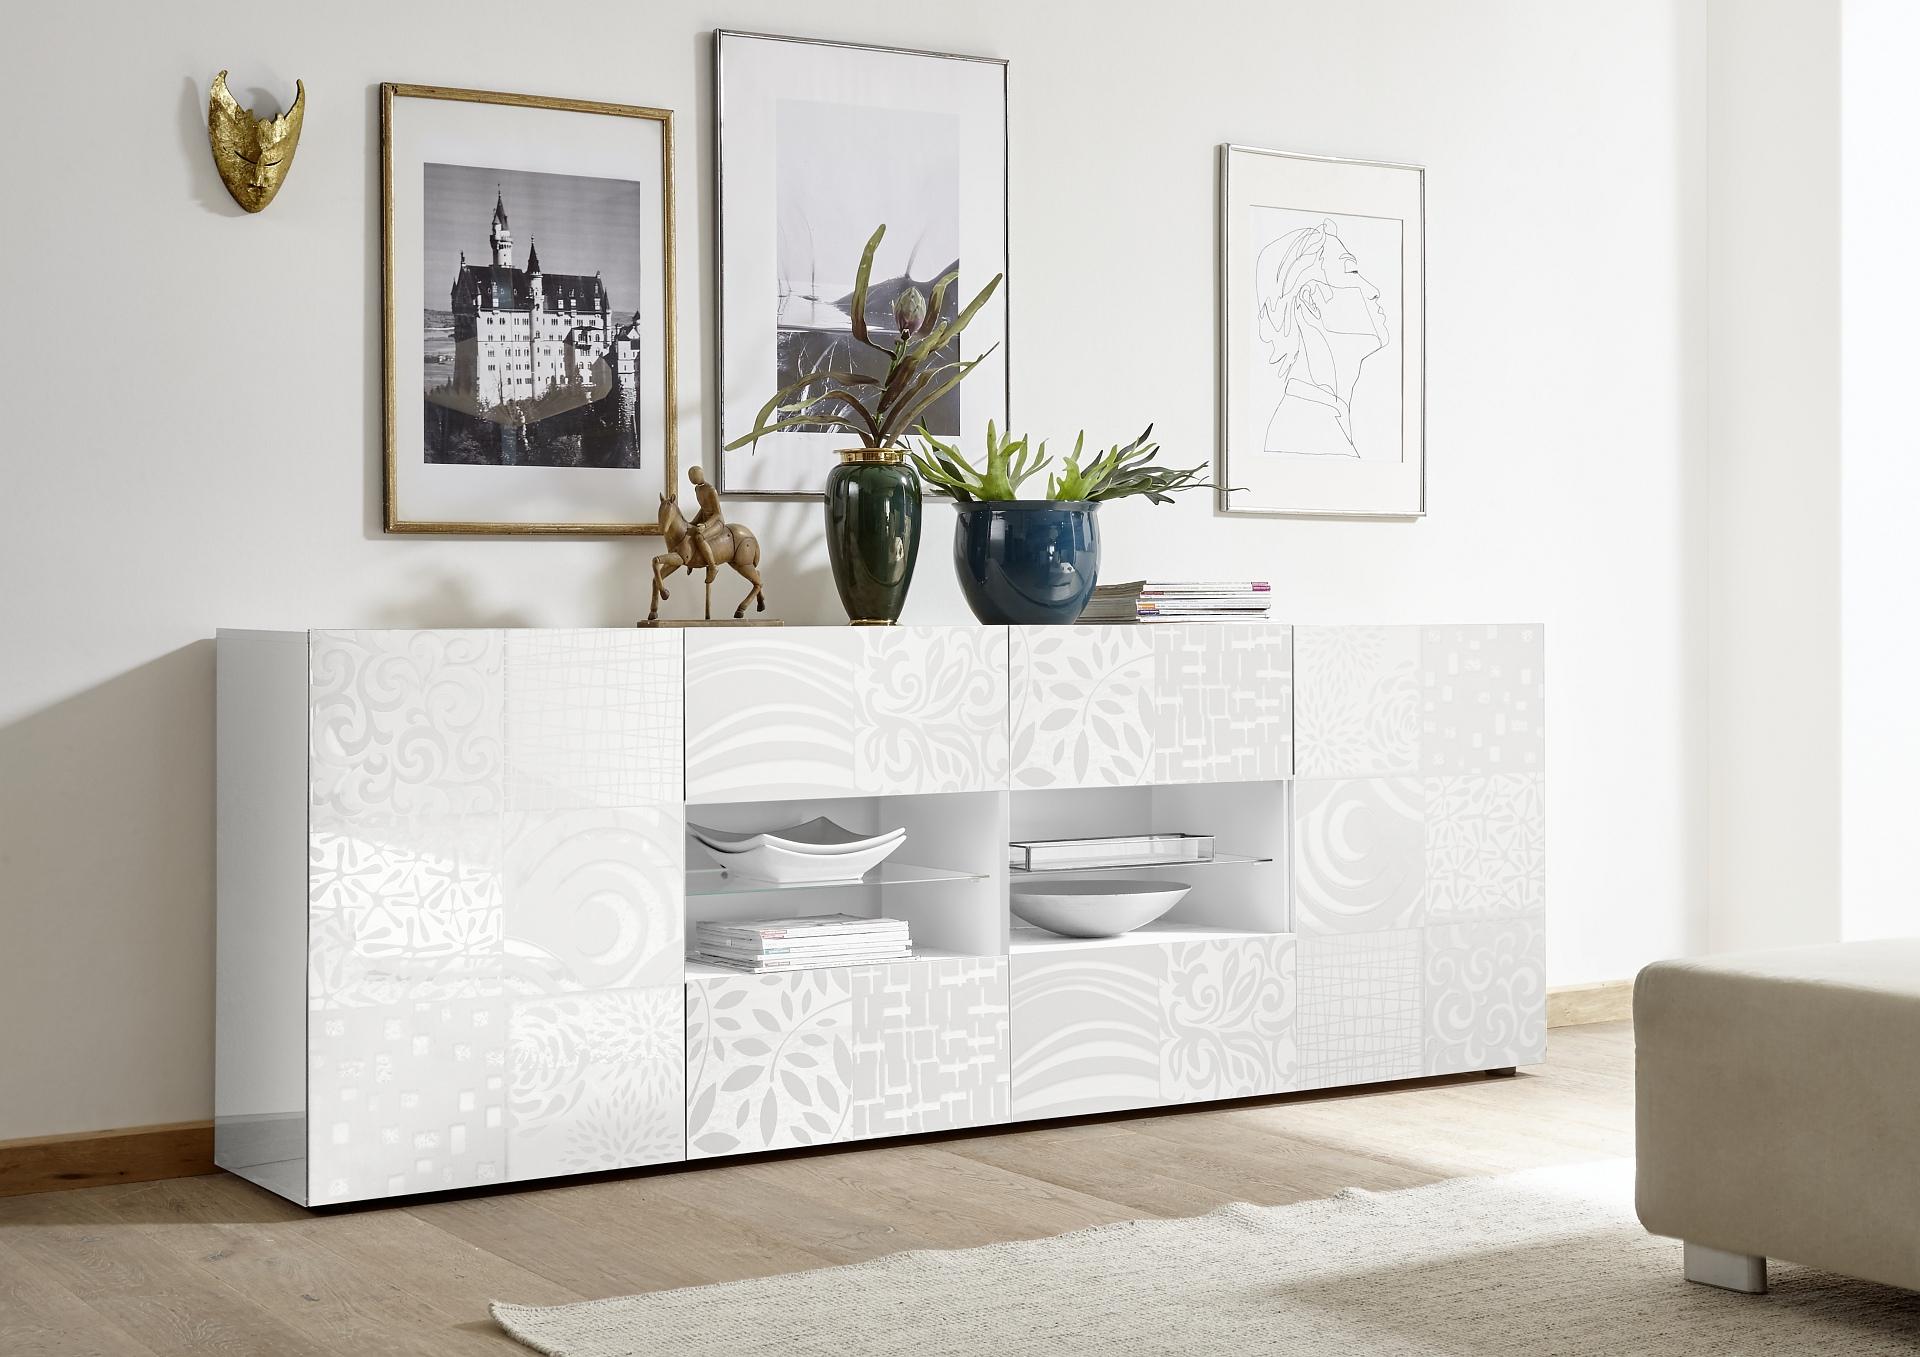 Aspect dressoir d l hoogglans wit goedkoopste op woning design